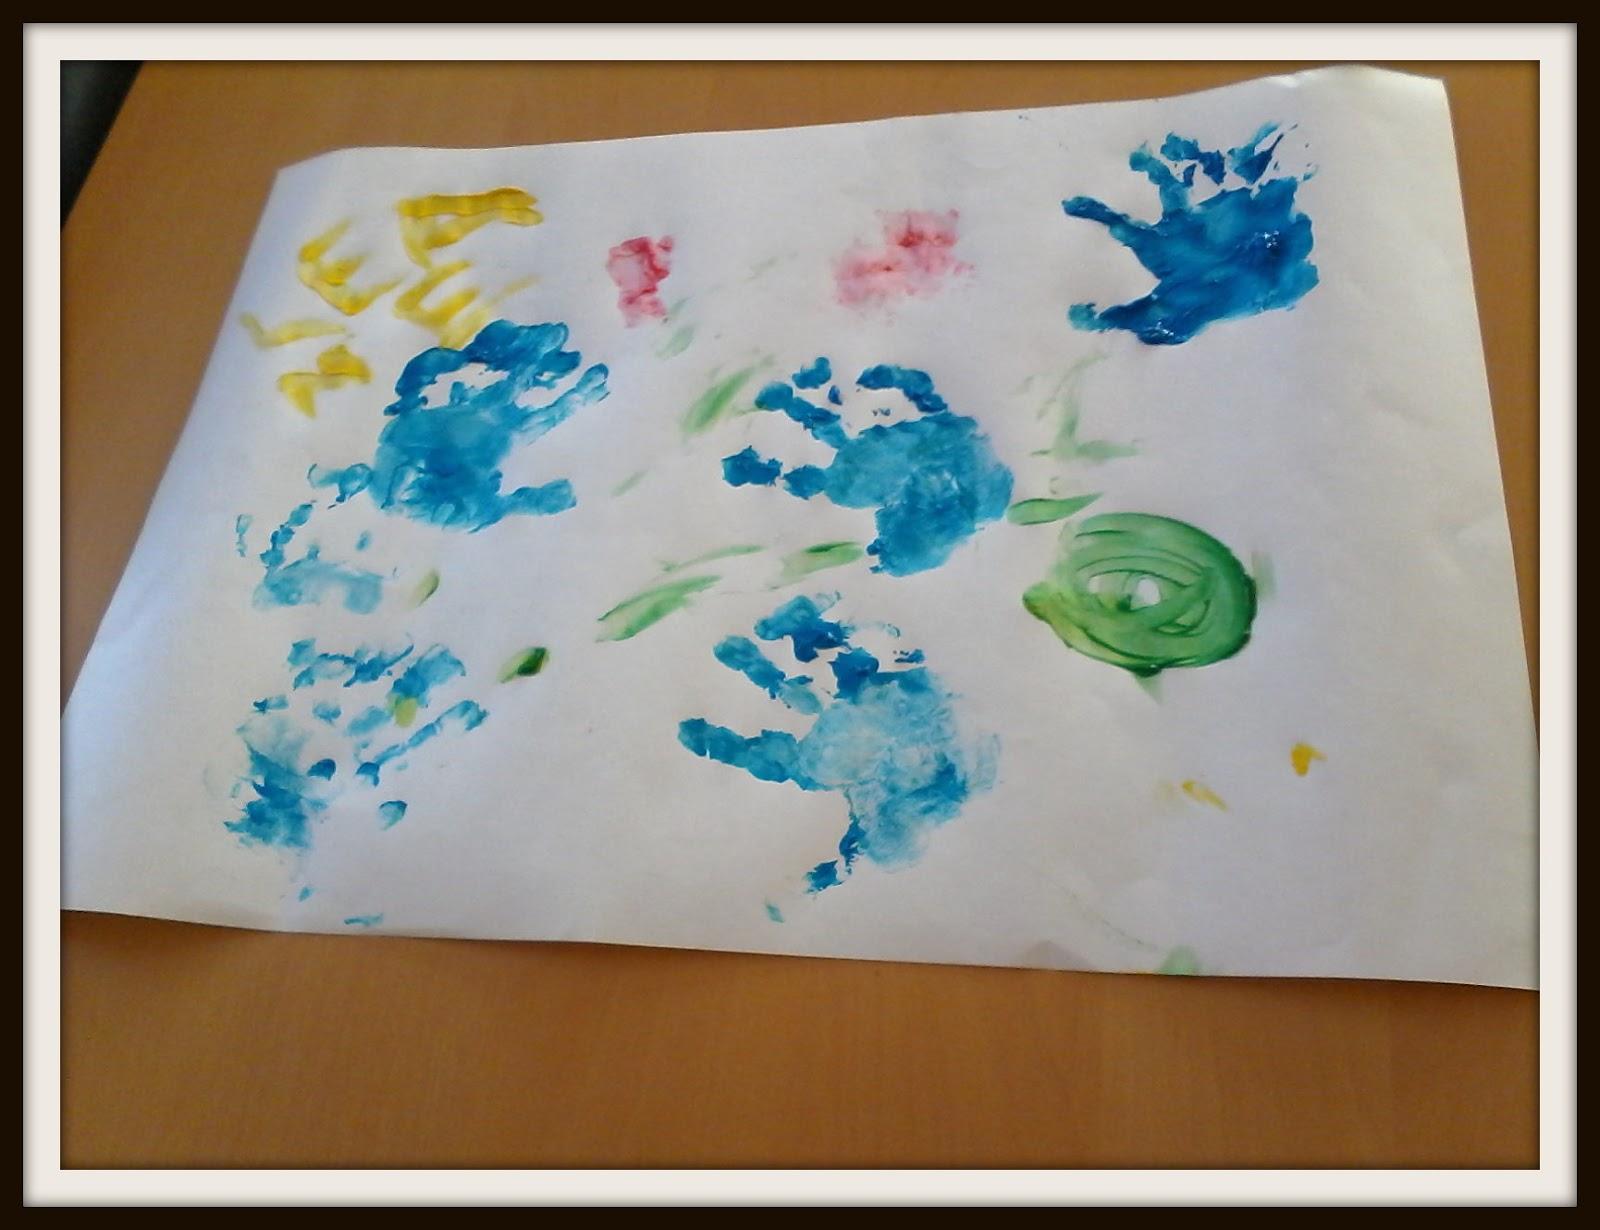 BB Koala bambin peinture activité RAM jouer assistantes maternelles